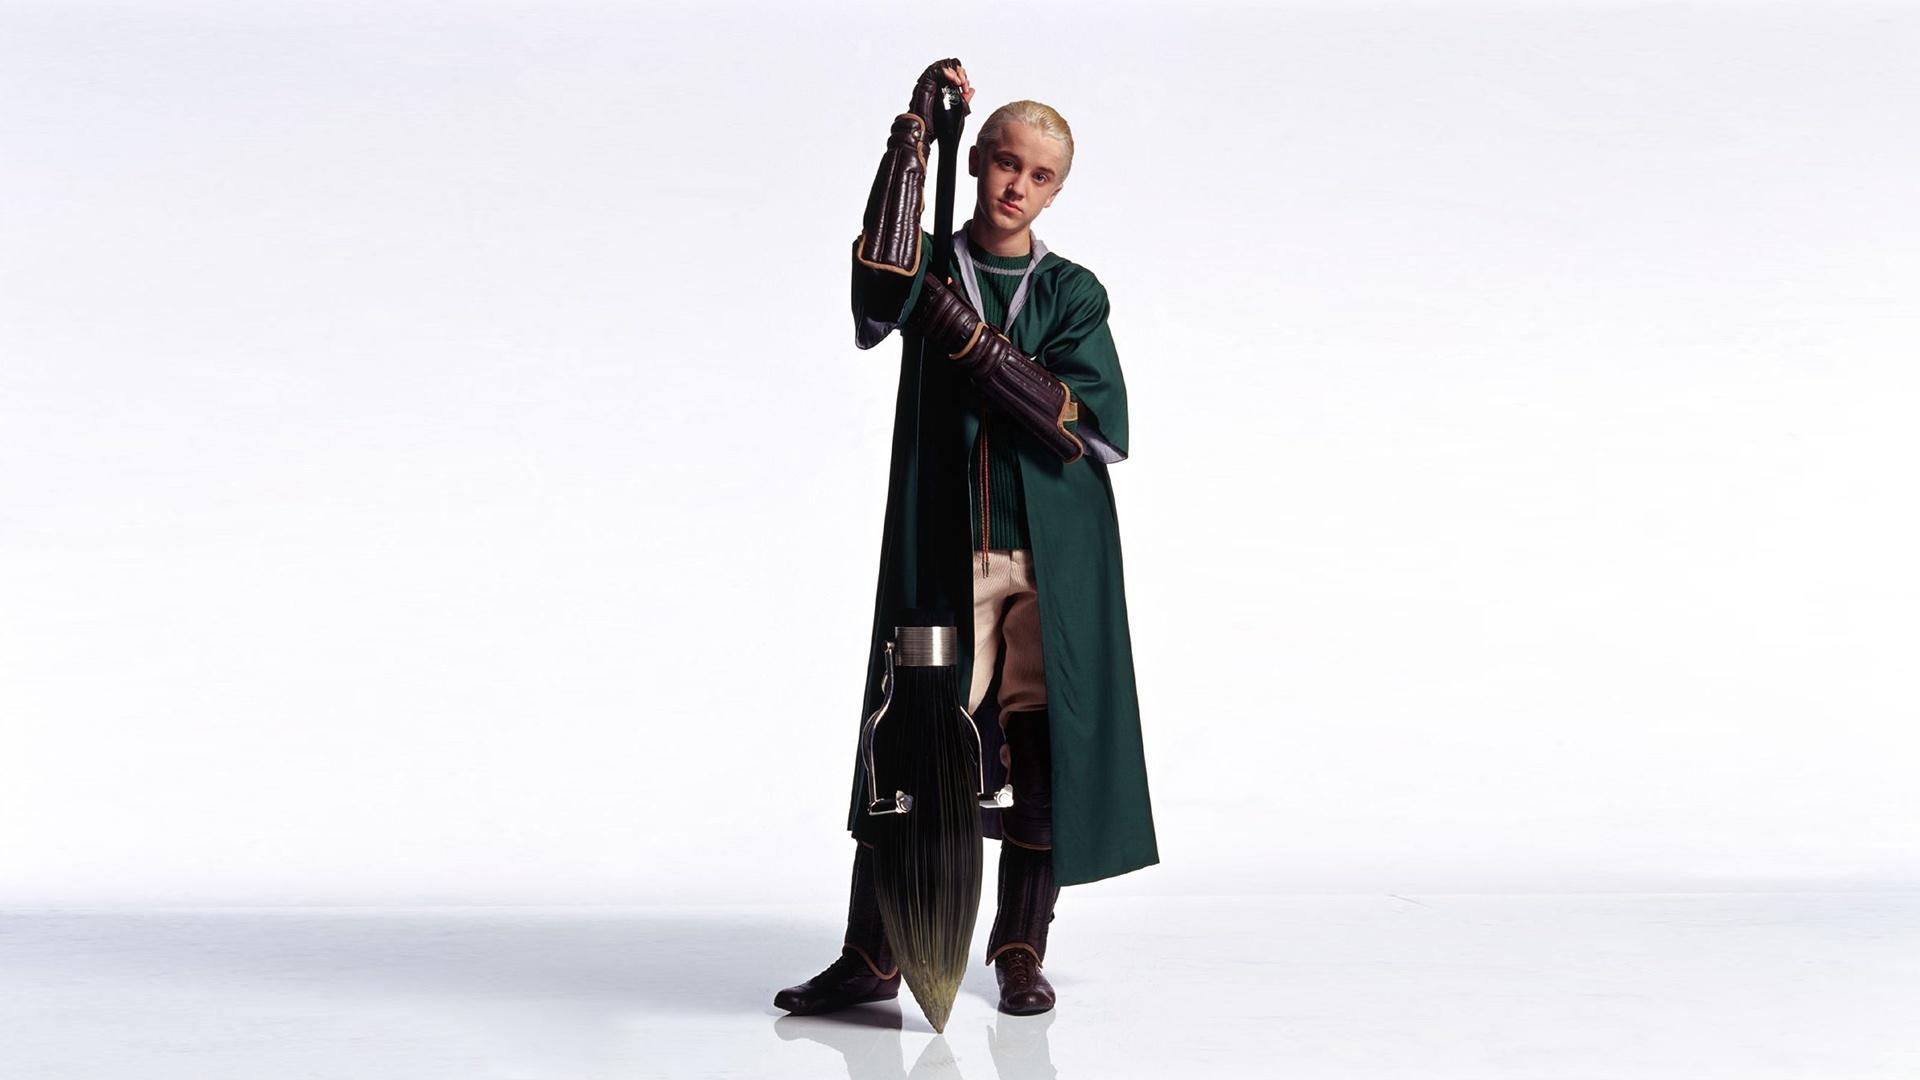 Draco Malfoy laptop wallpaper